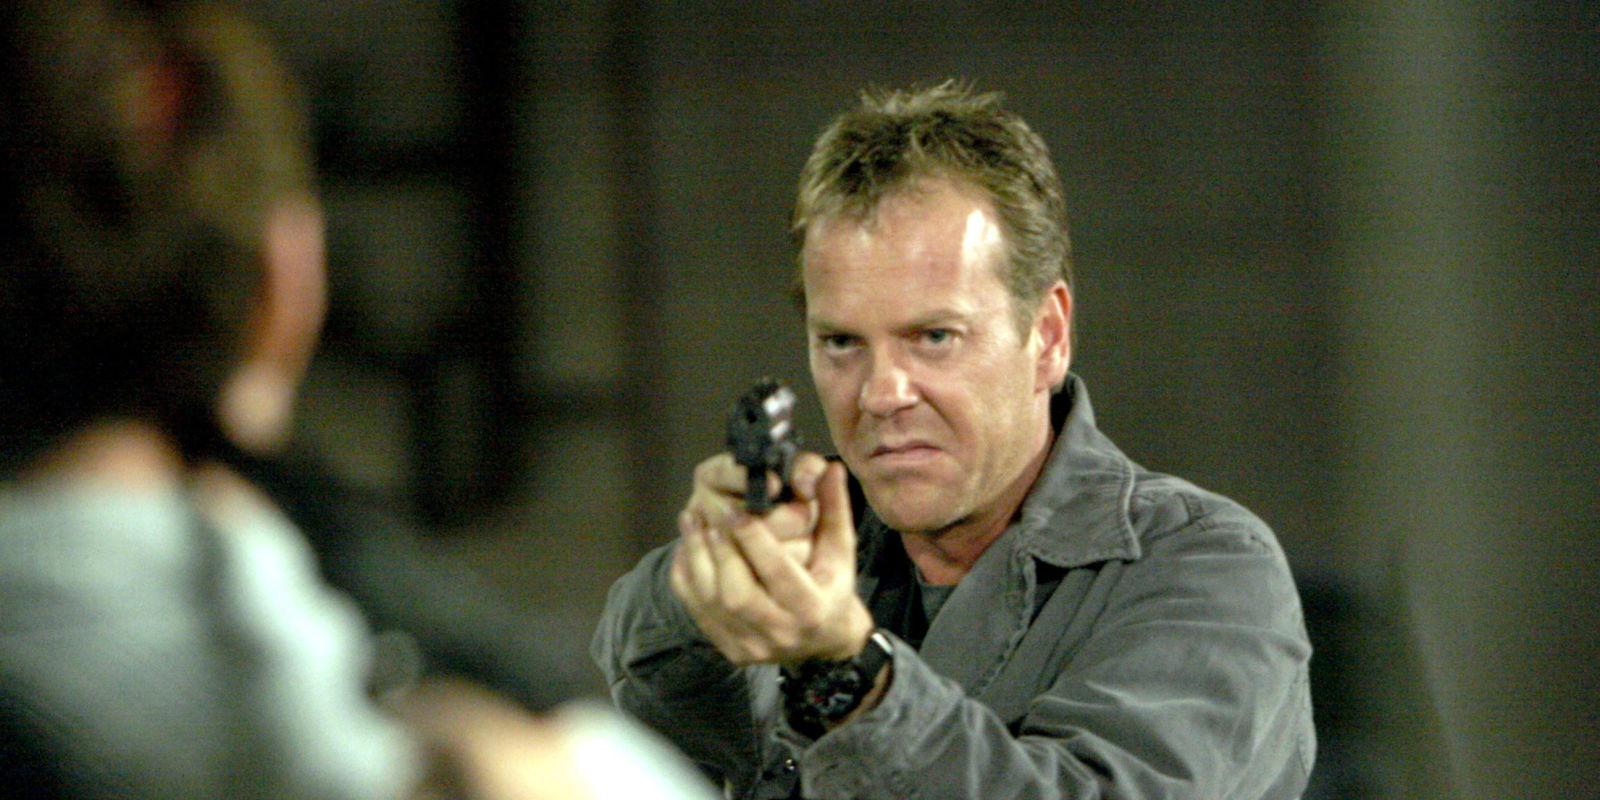 24\'s Kiefer Sutherland talks about returning to Jack Bauer: \